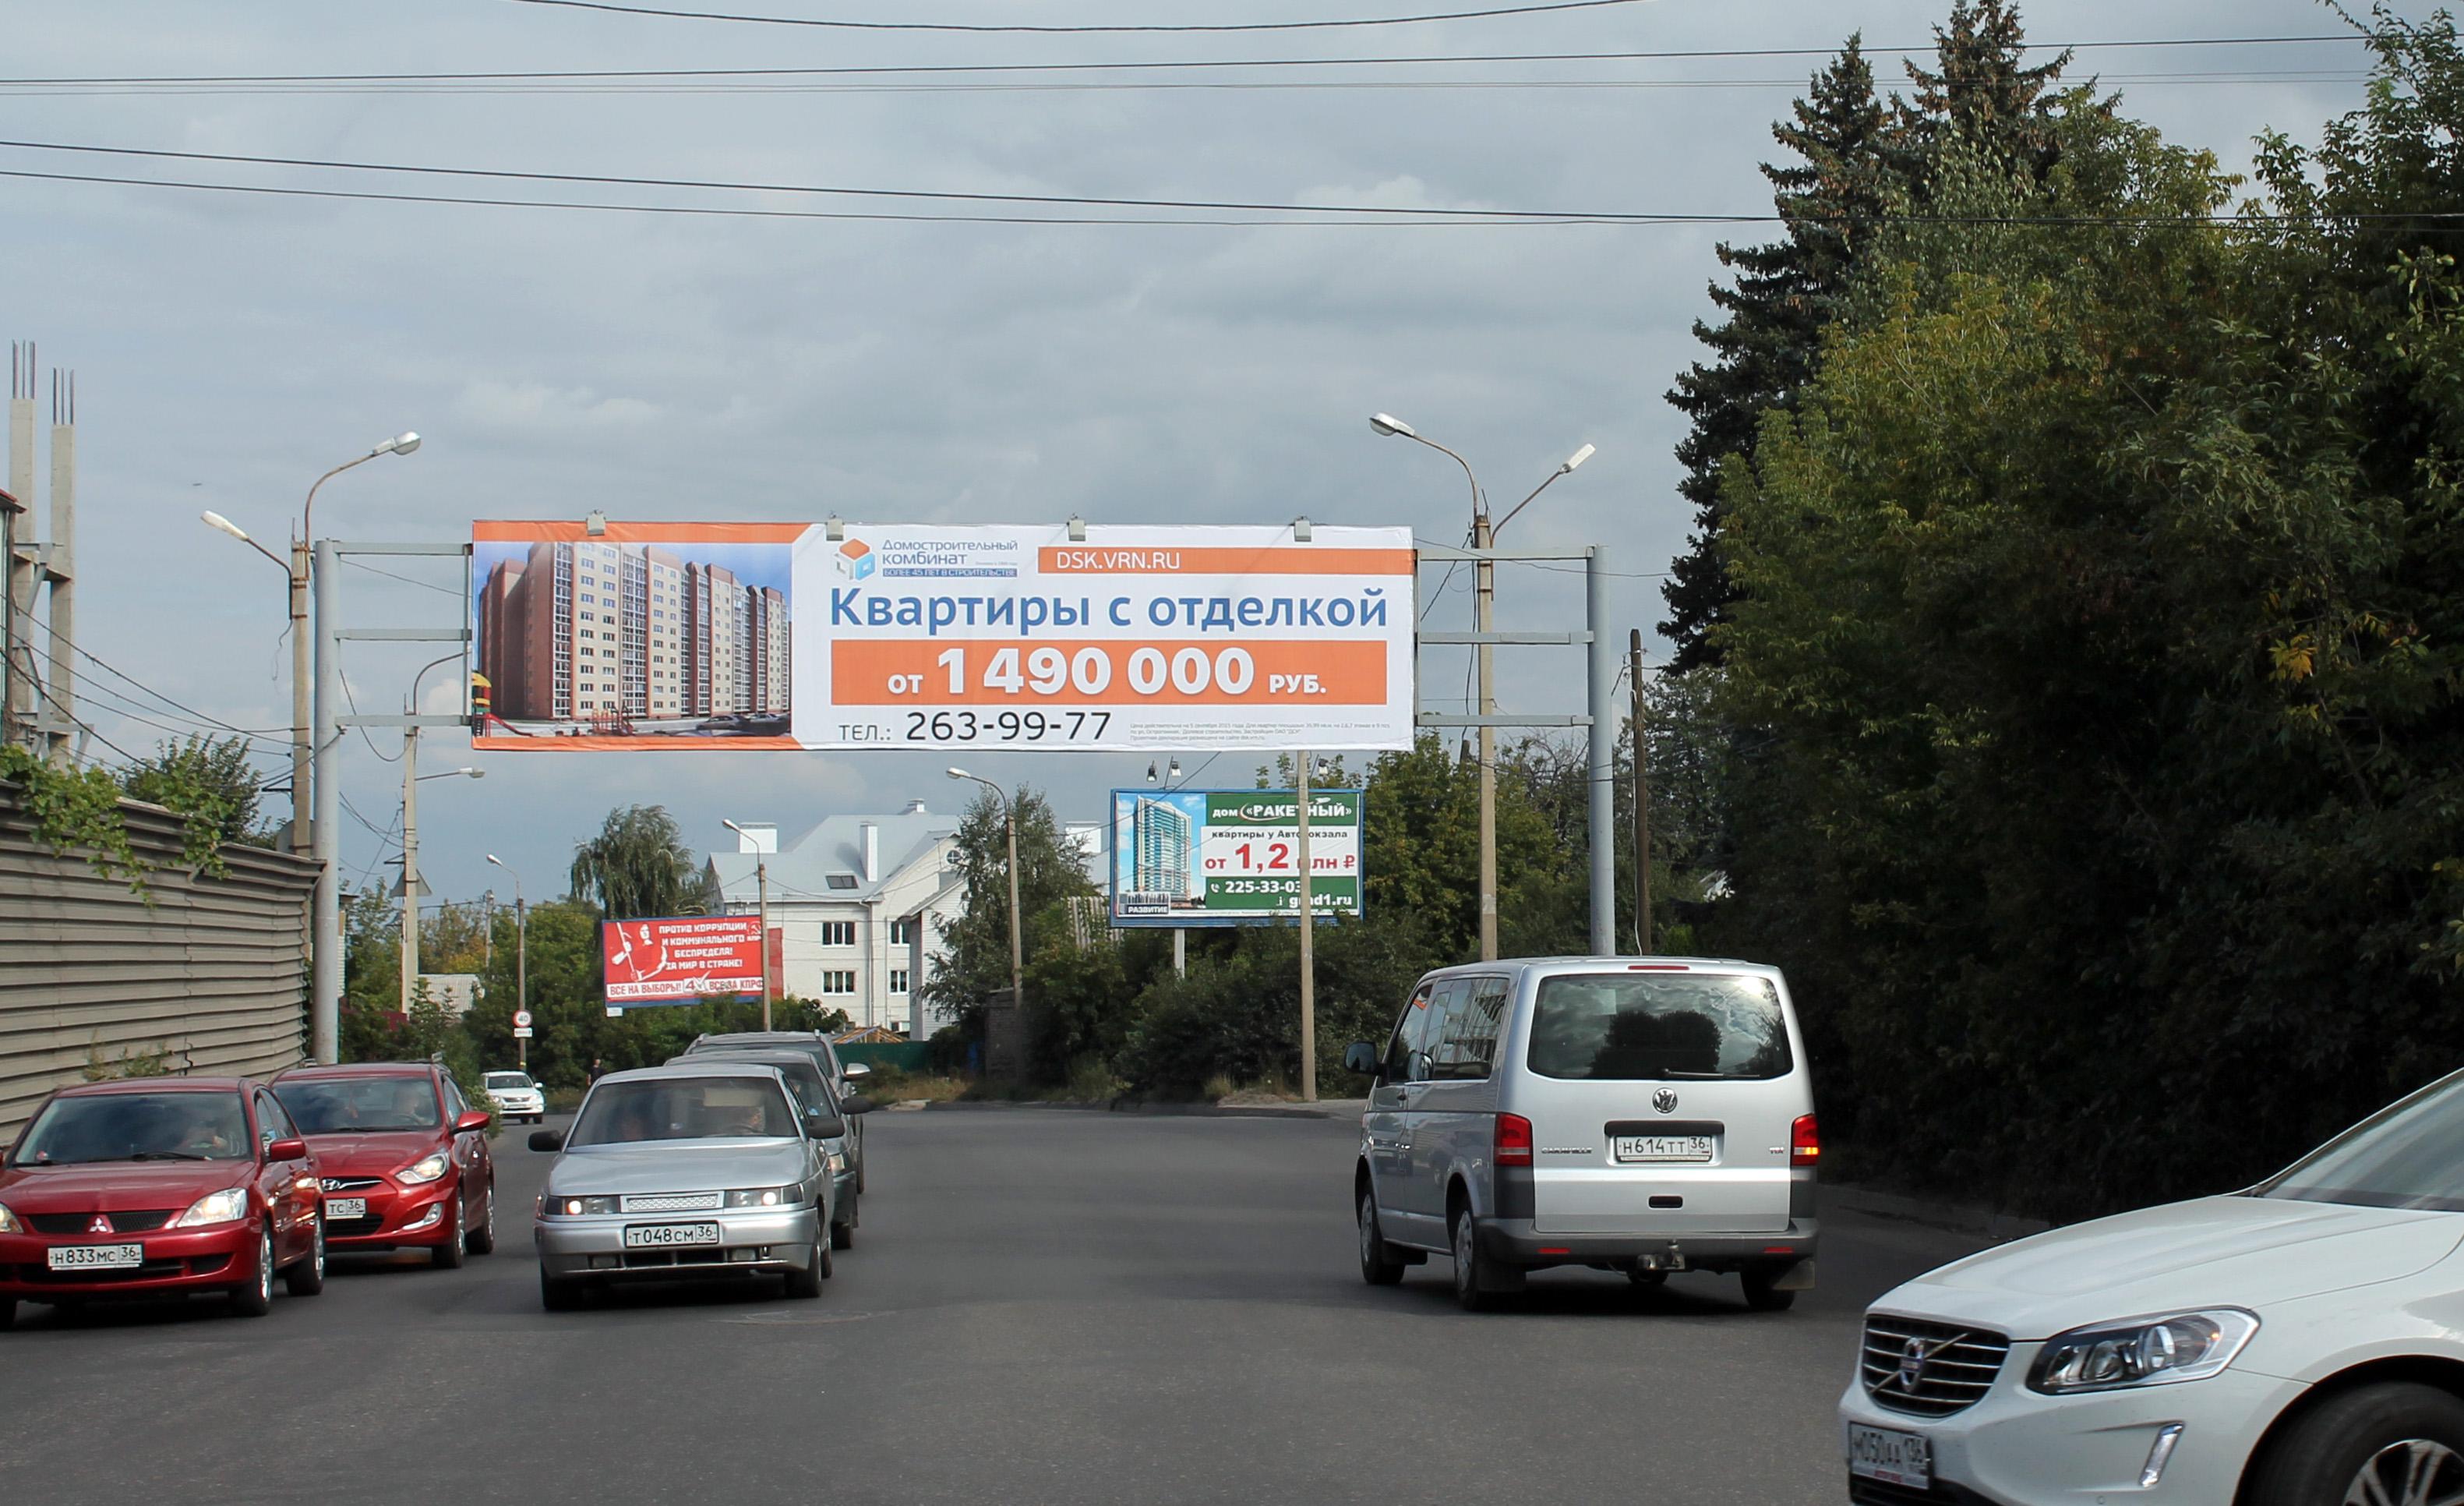 609 А1А2 ул Бурденко 2 портал в центр